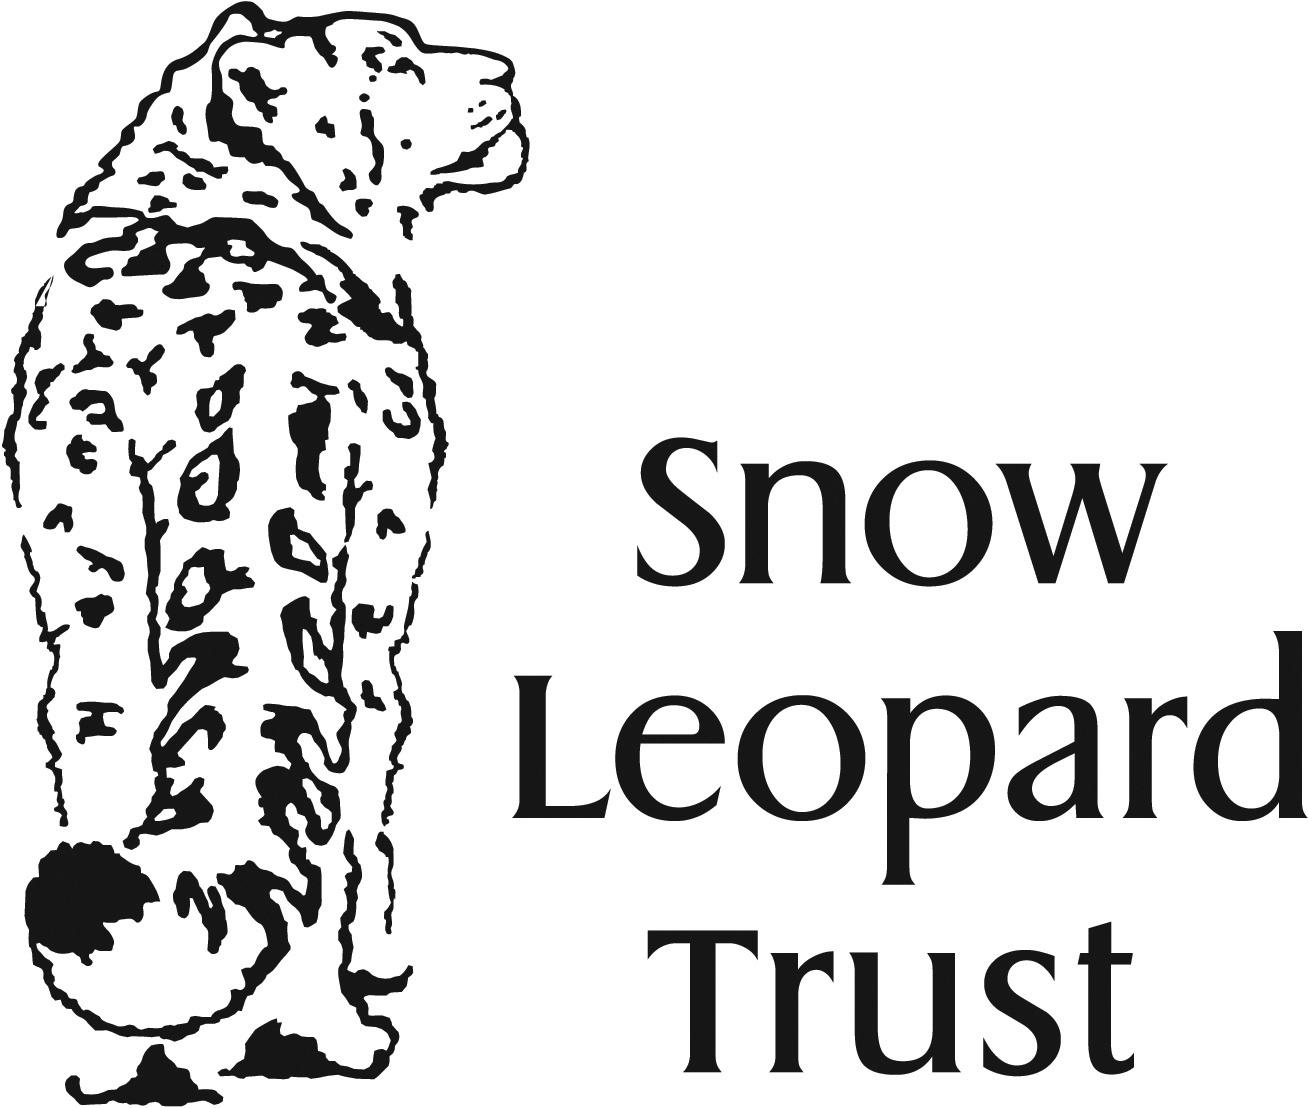 logo for International Snow Leopard Trust